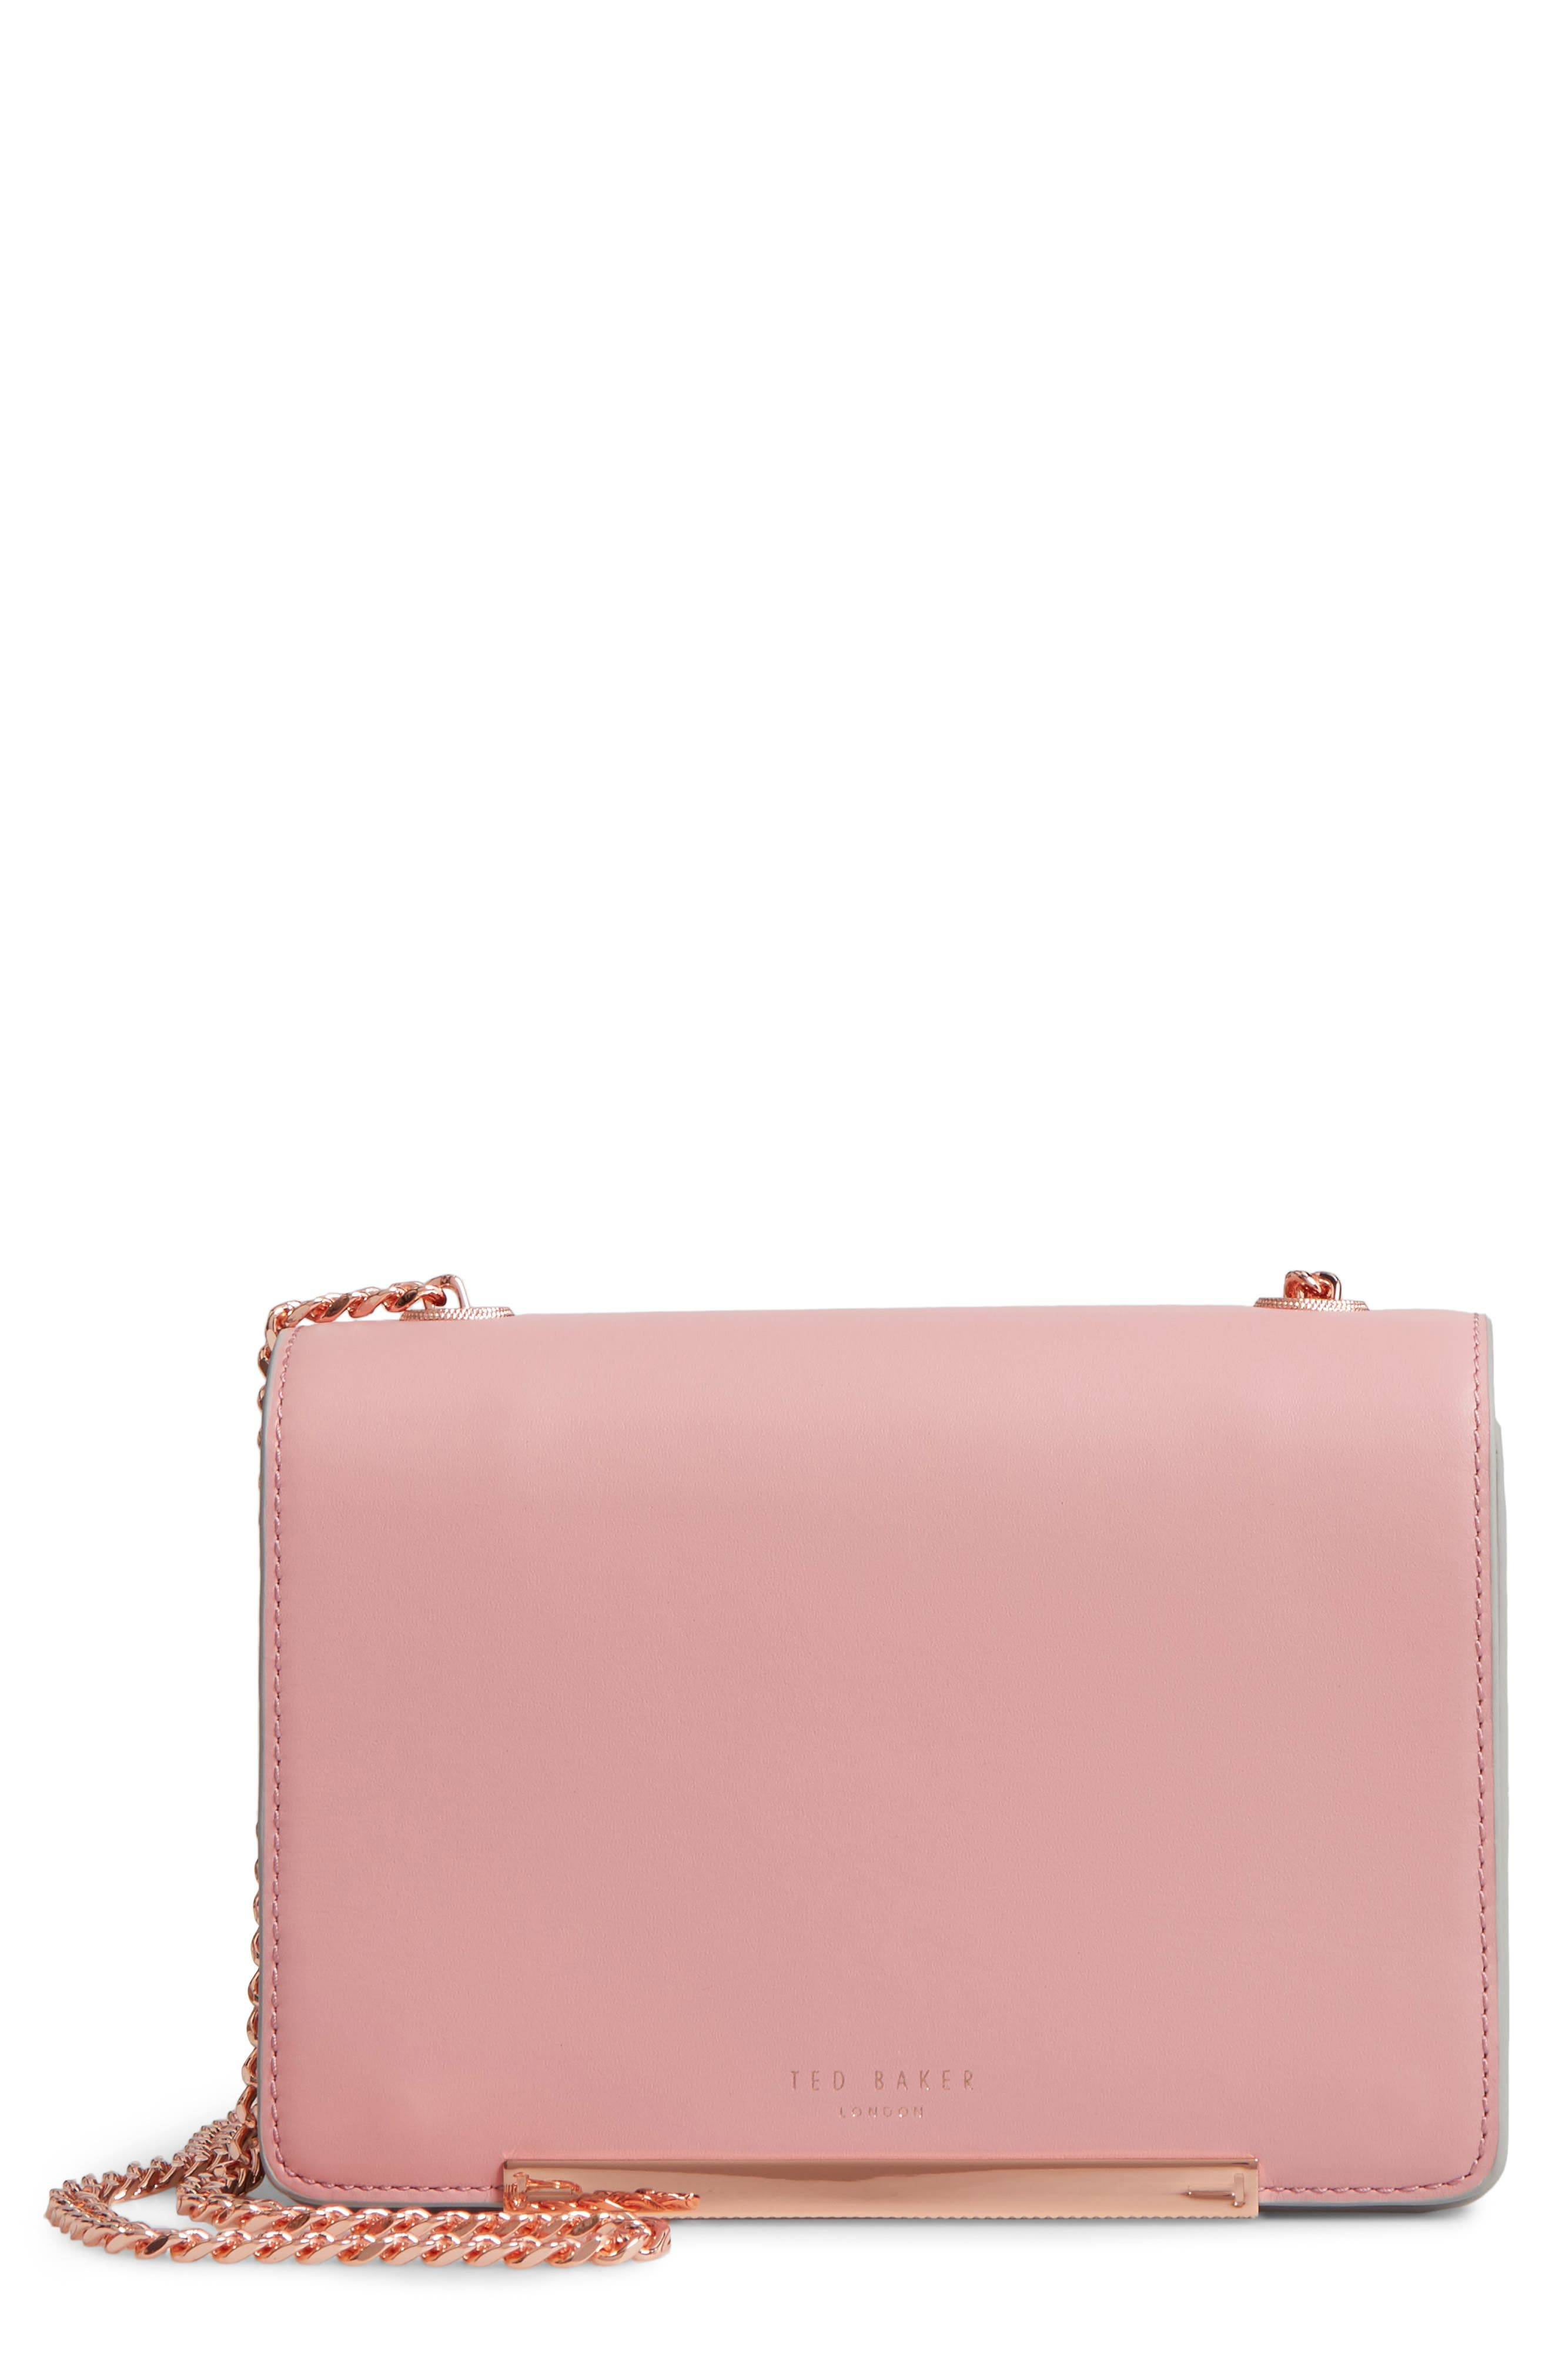 Earie Leather Crossbody Bag,                         Main,                         color, Dusky Pink